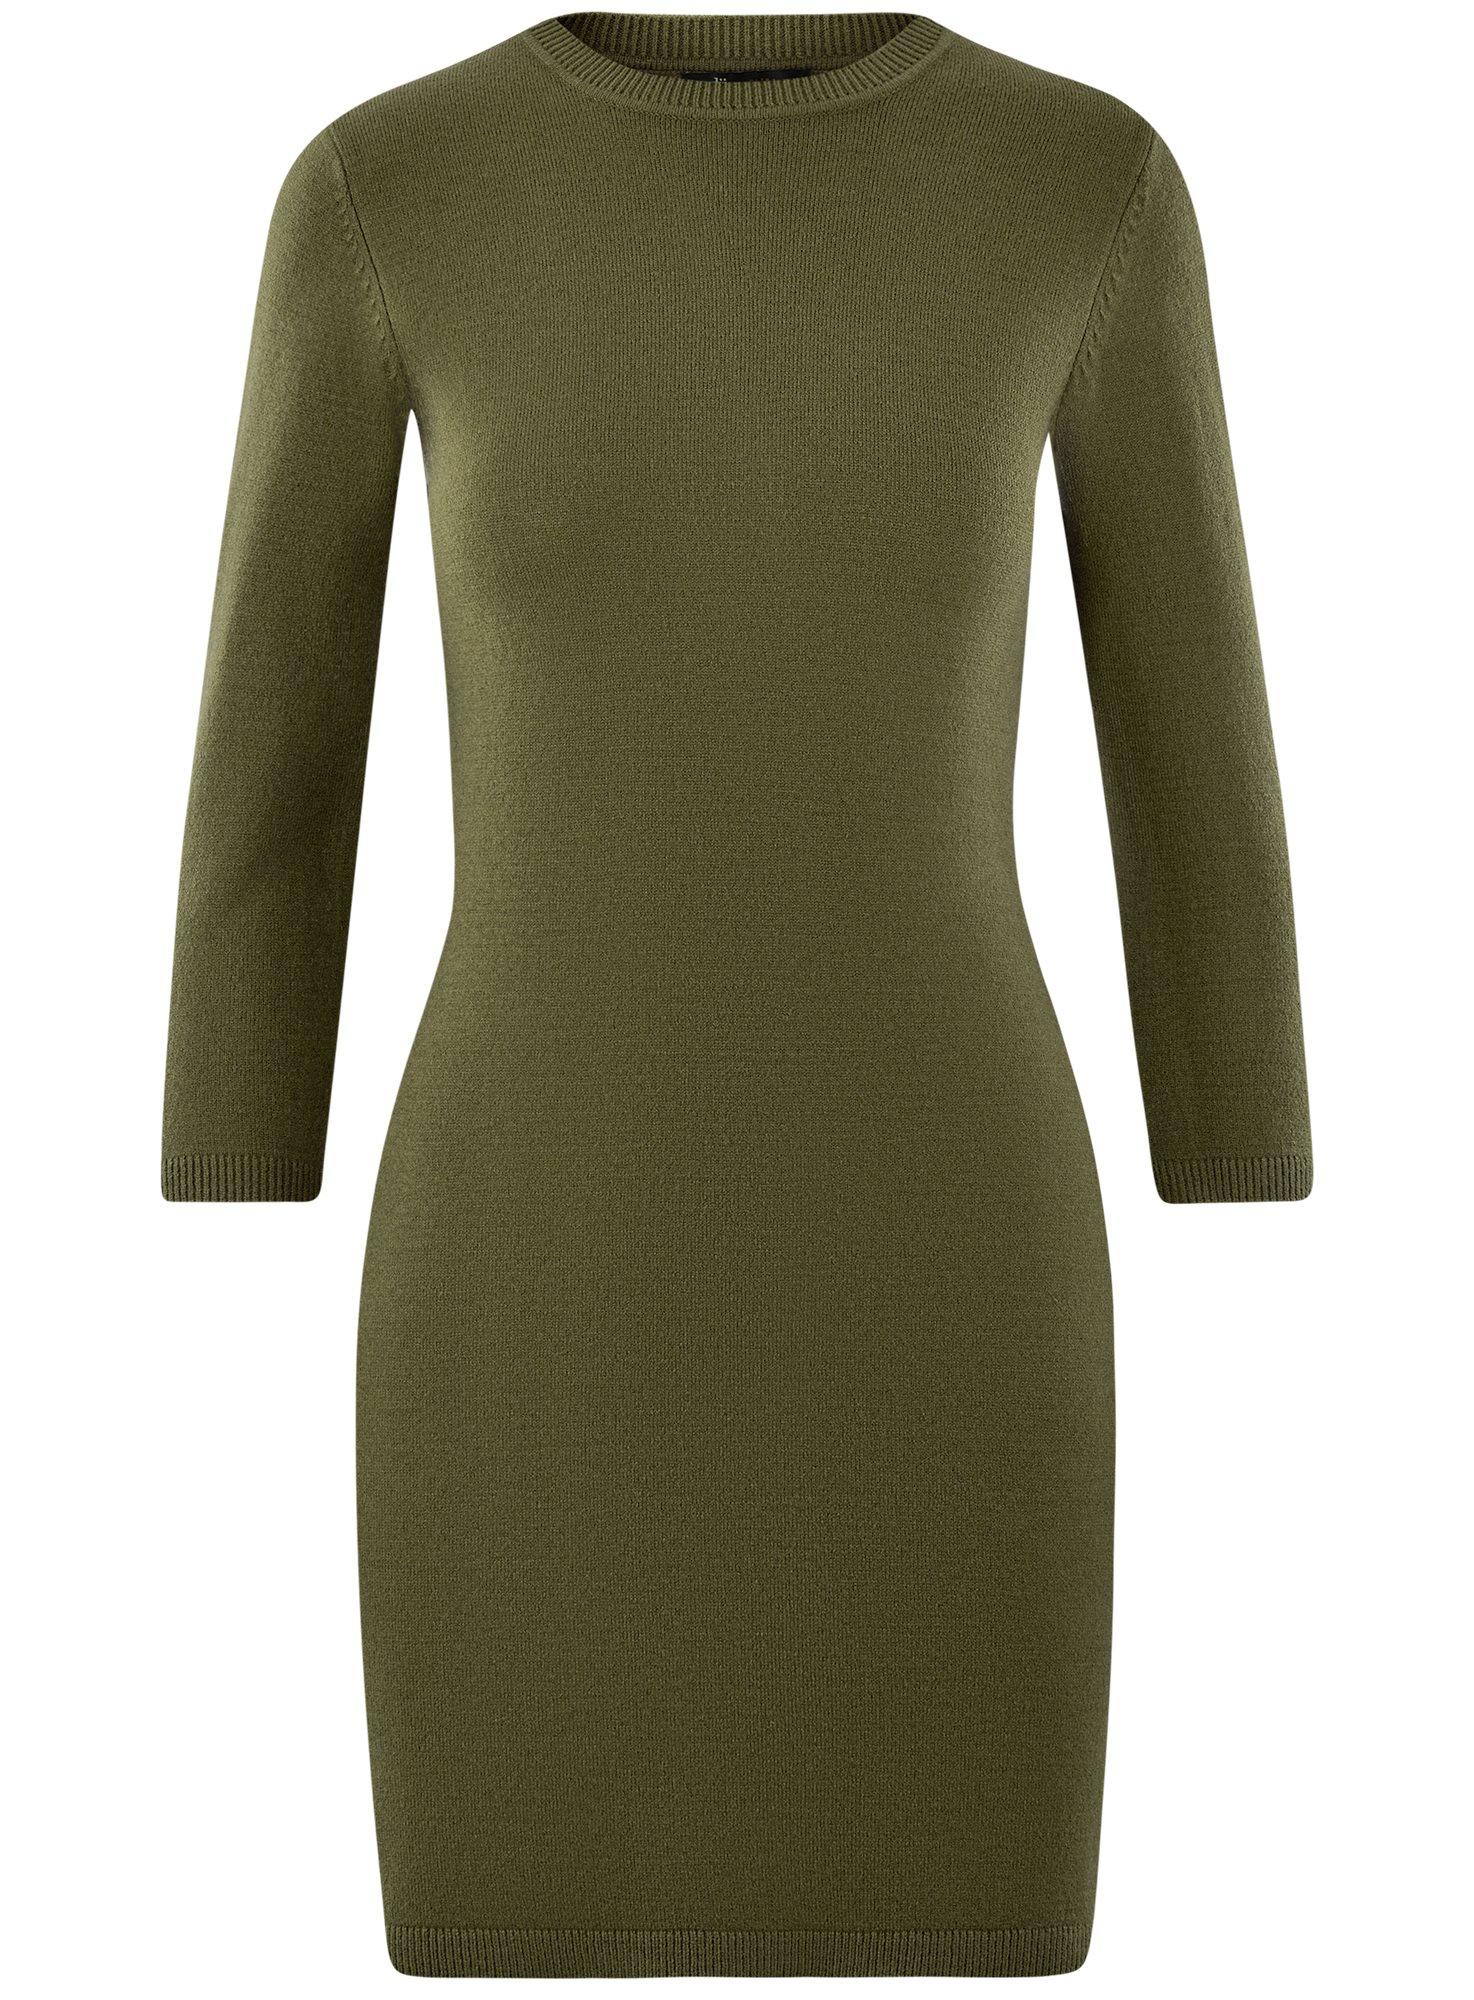 Платье вязаное с рукавом 3/4 oodji для женщины (зеленый), 63912222-2B/45109/6800N